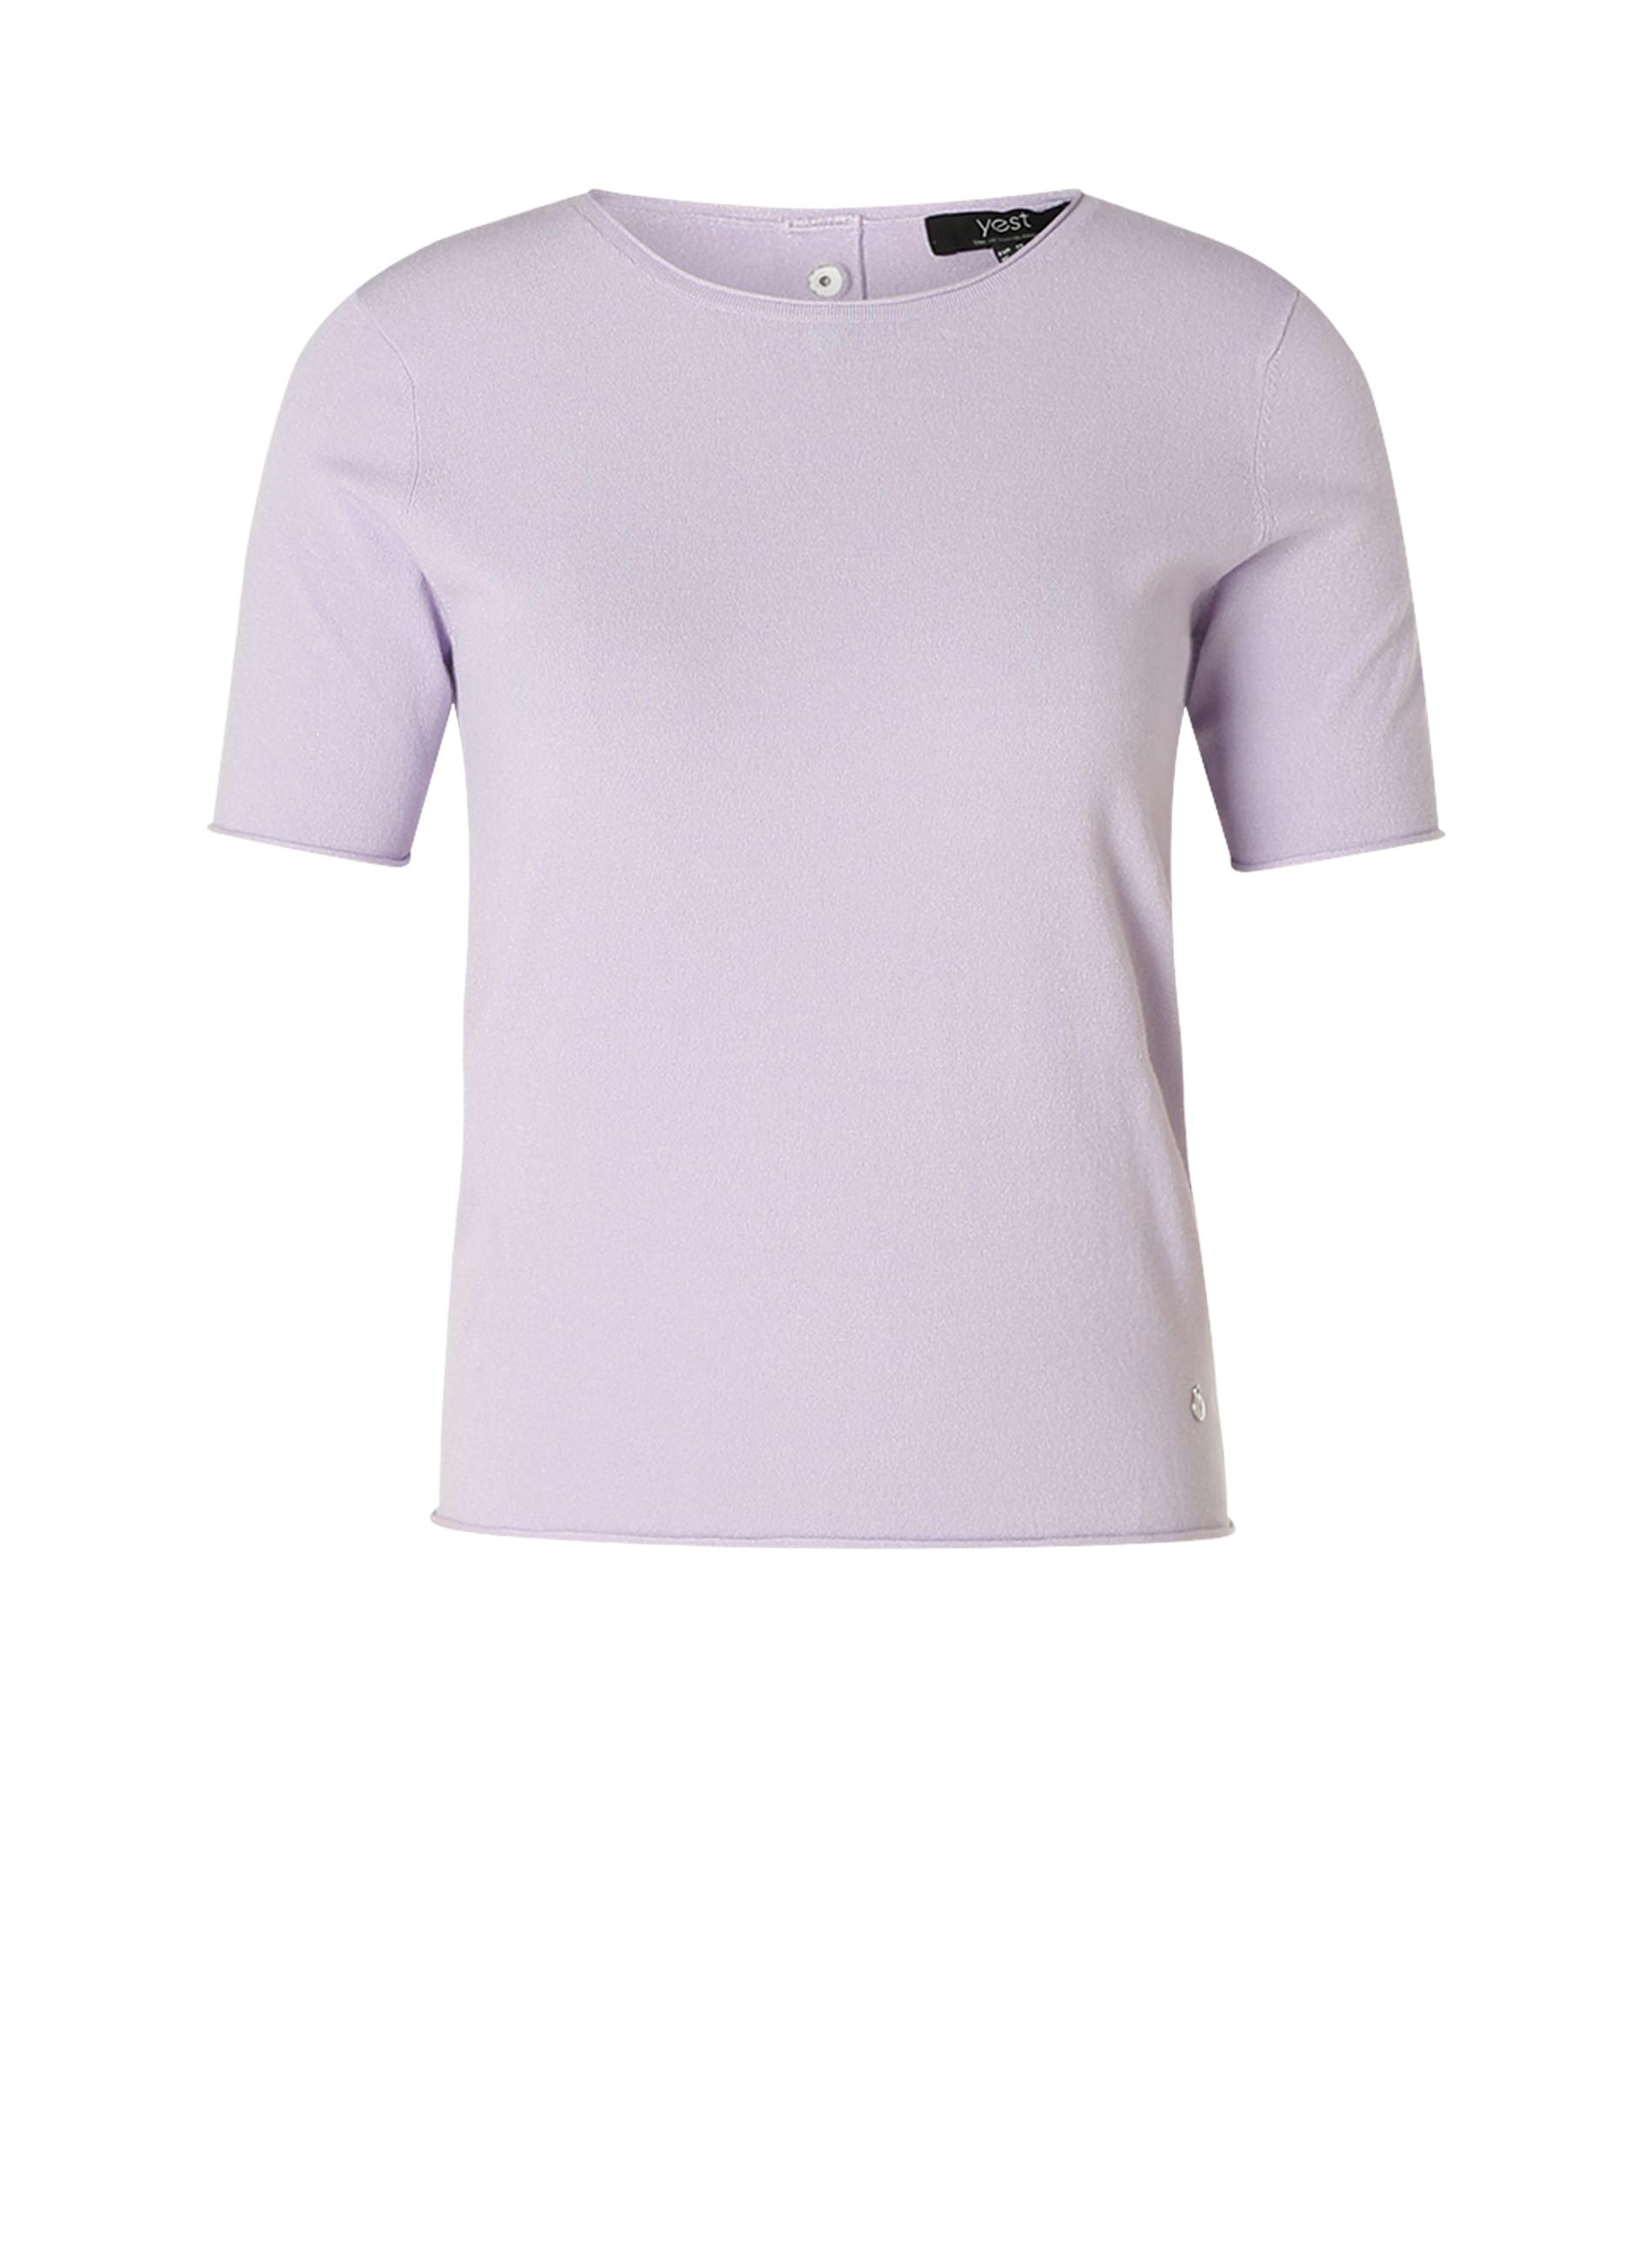 Yesta shirt met drukknoopjes